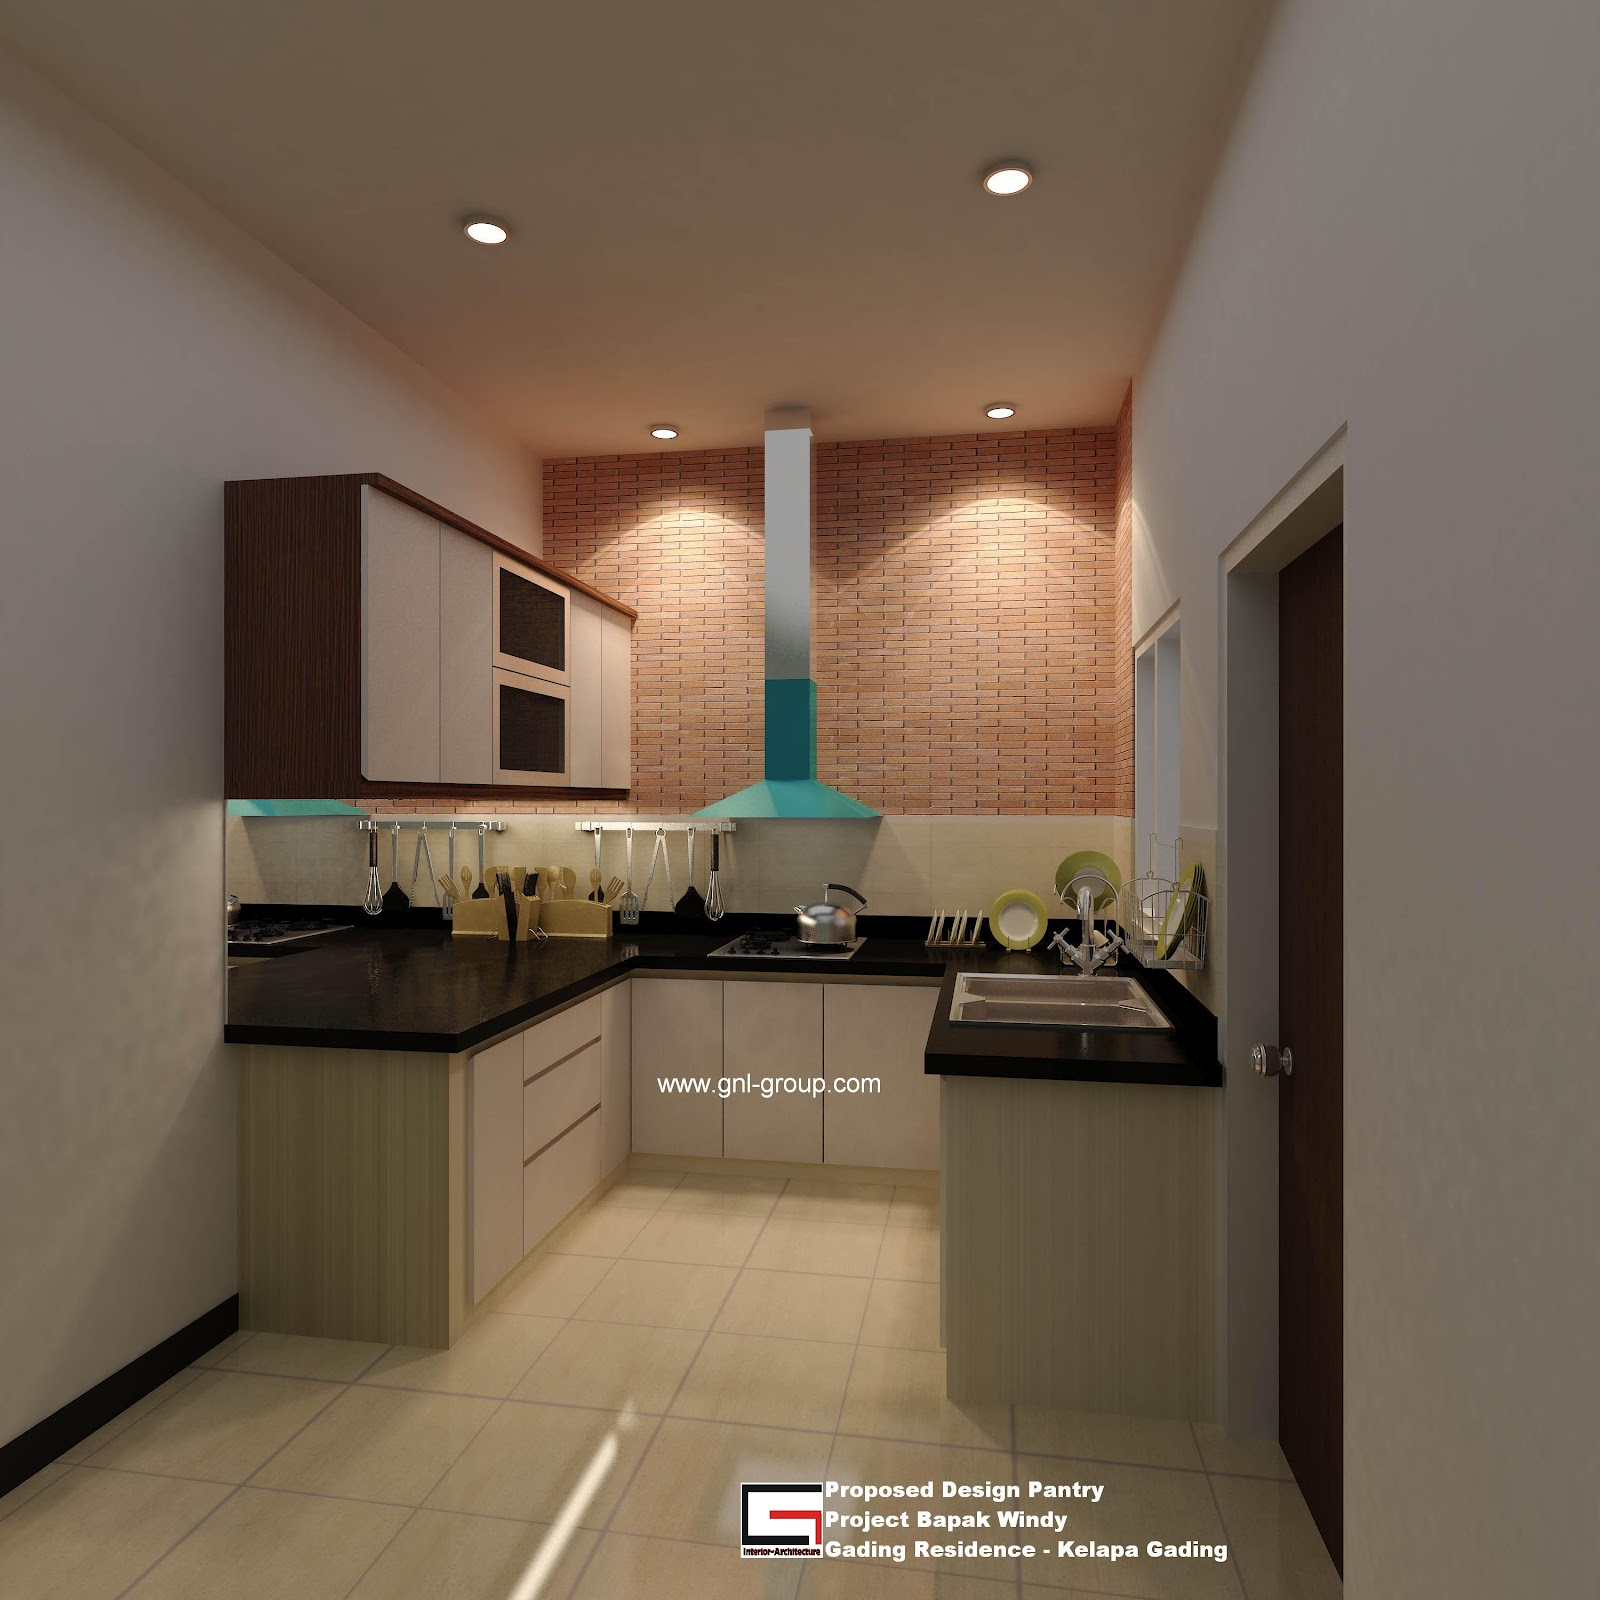 design interior kitchen set minimalis. design interior desain kitchen set minimalis terbaik dan Awesome Design Kitchen Set Minimalis Modern  Taste